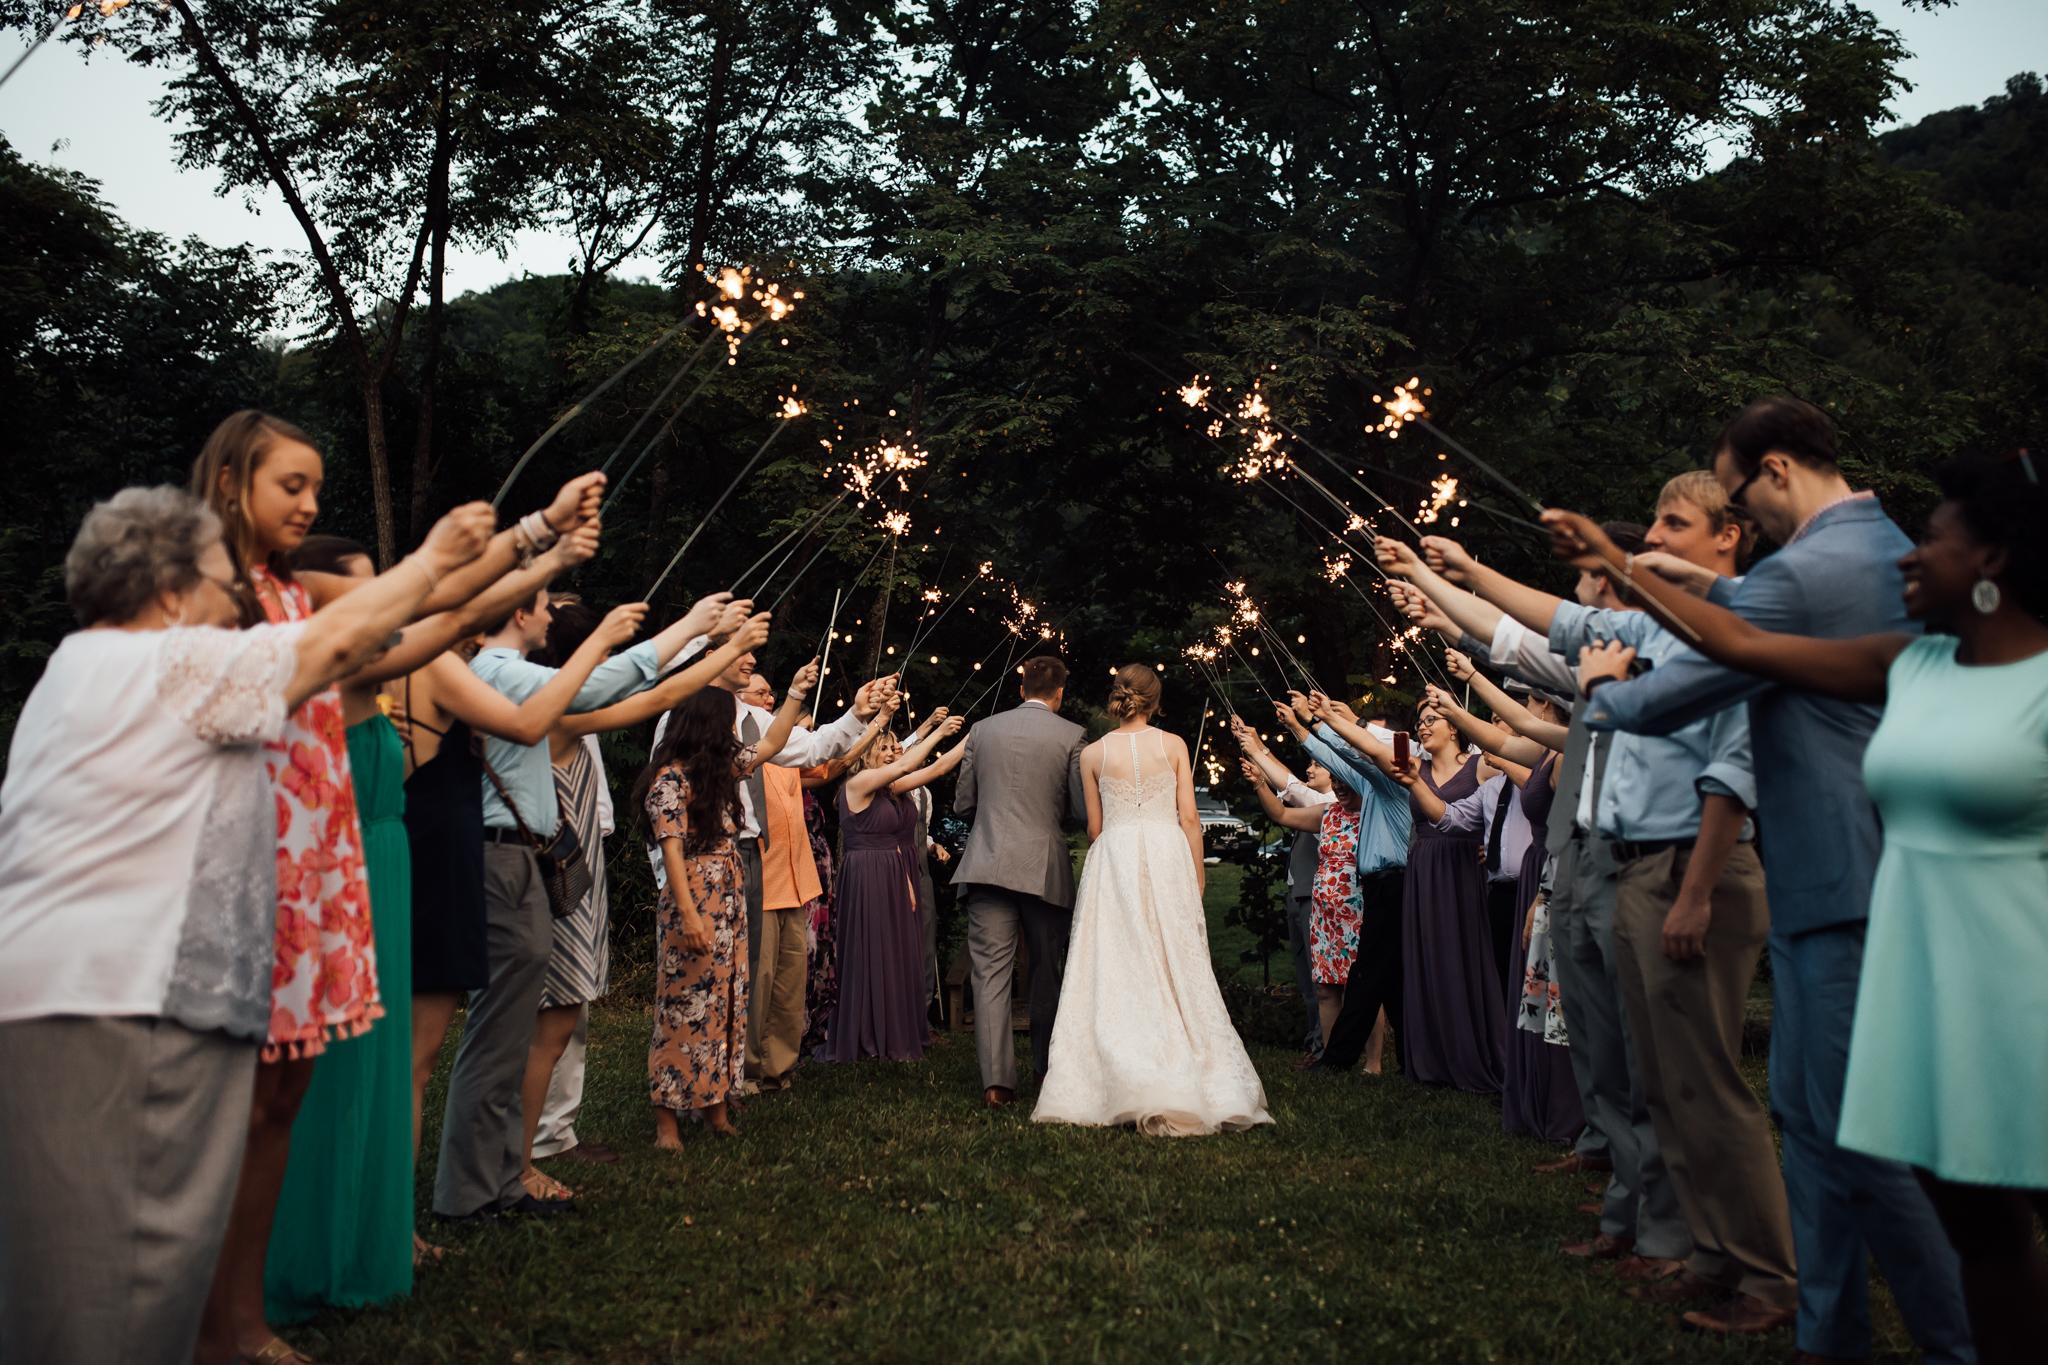 asheville-wedding-photographers-TheBasilicaofSt.Lawrence-IvyCreekFamilyFarm-thewarmtharoundyou (52 of 52).jpg